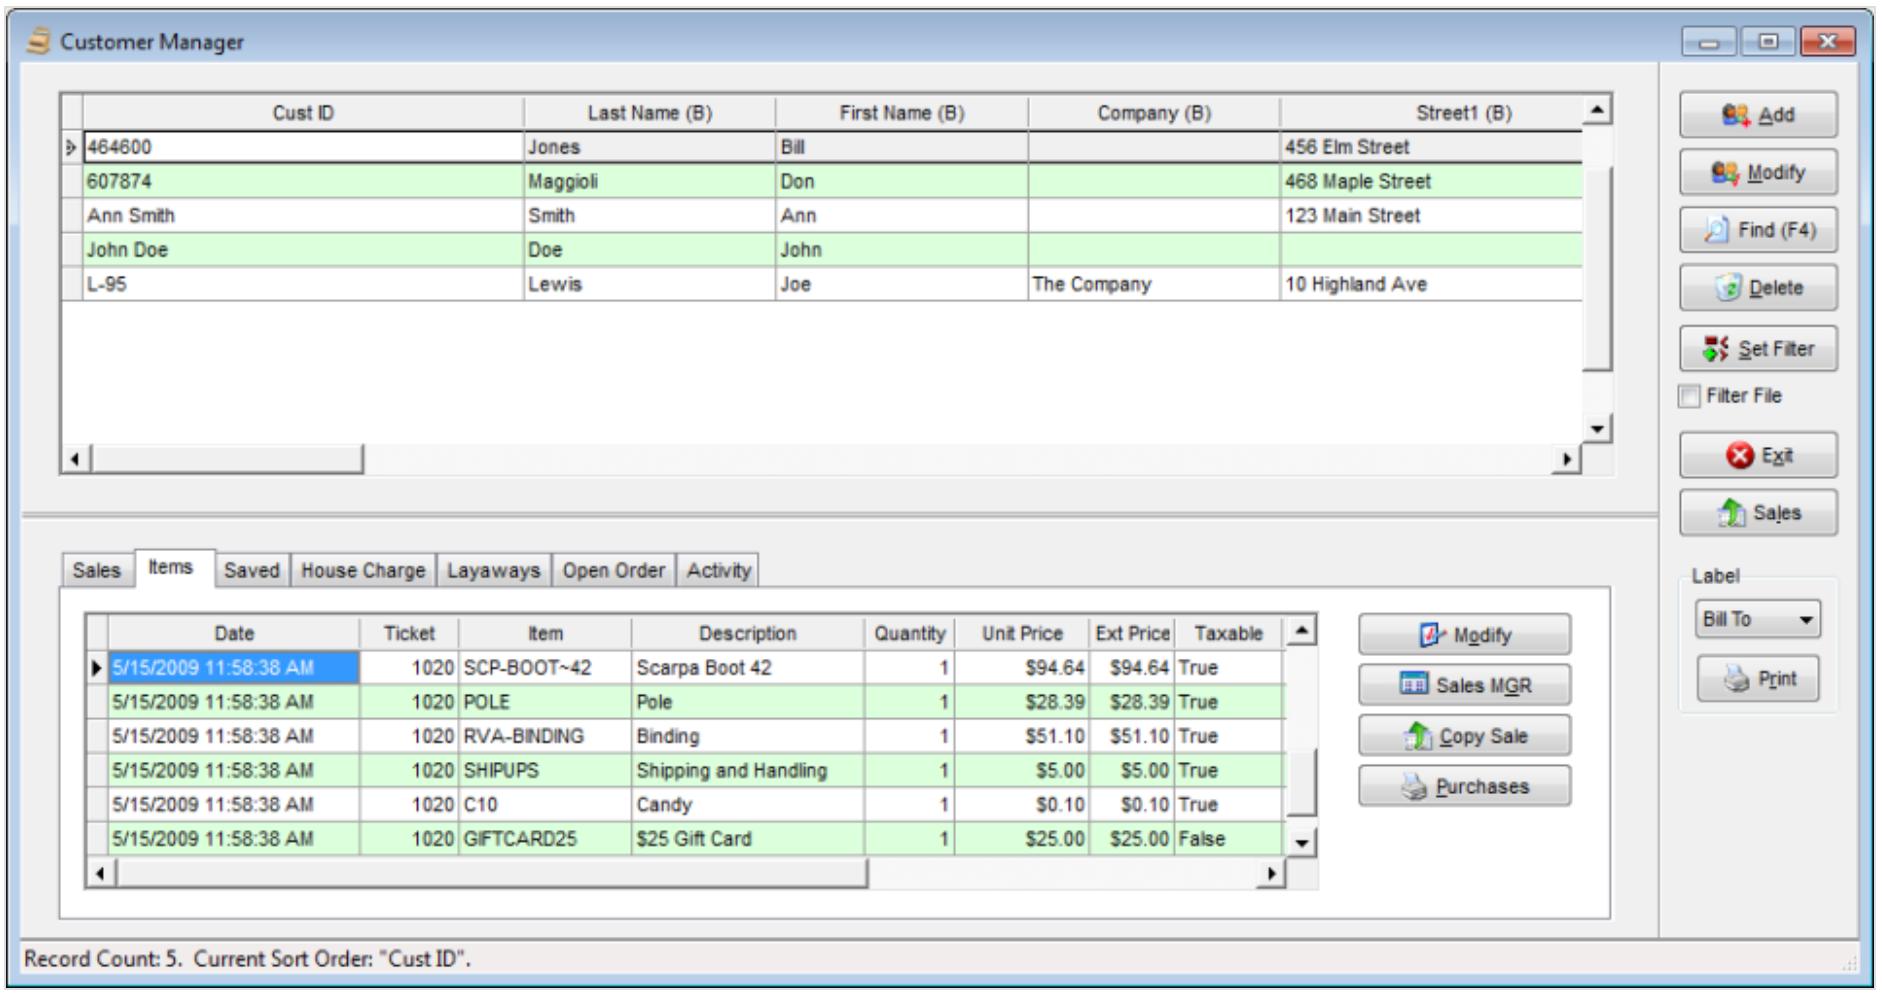 RetailEdge Software - RetailEdge customer manager